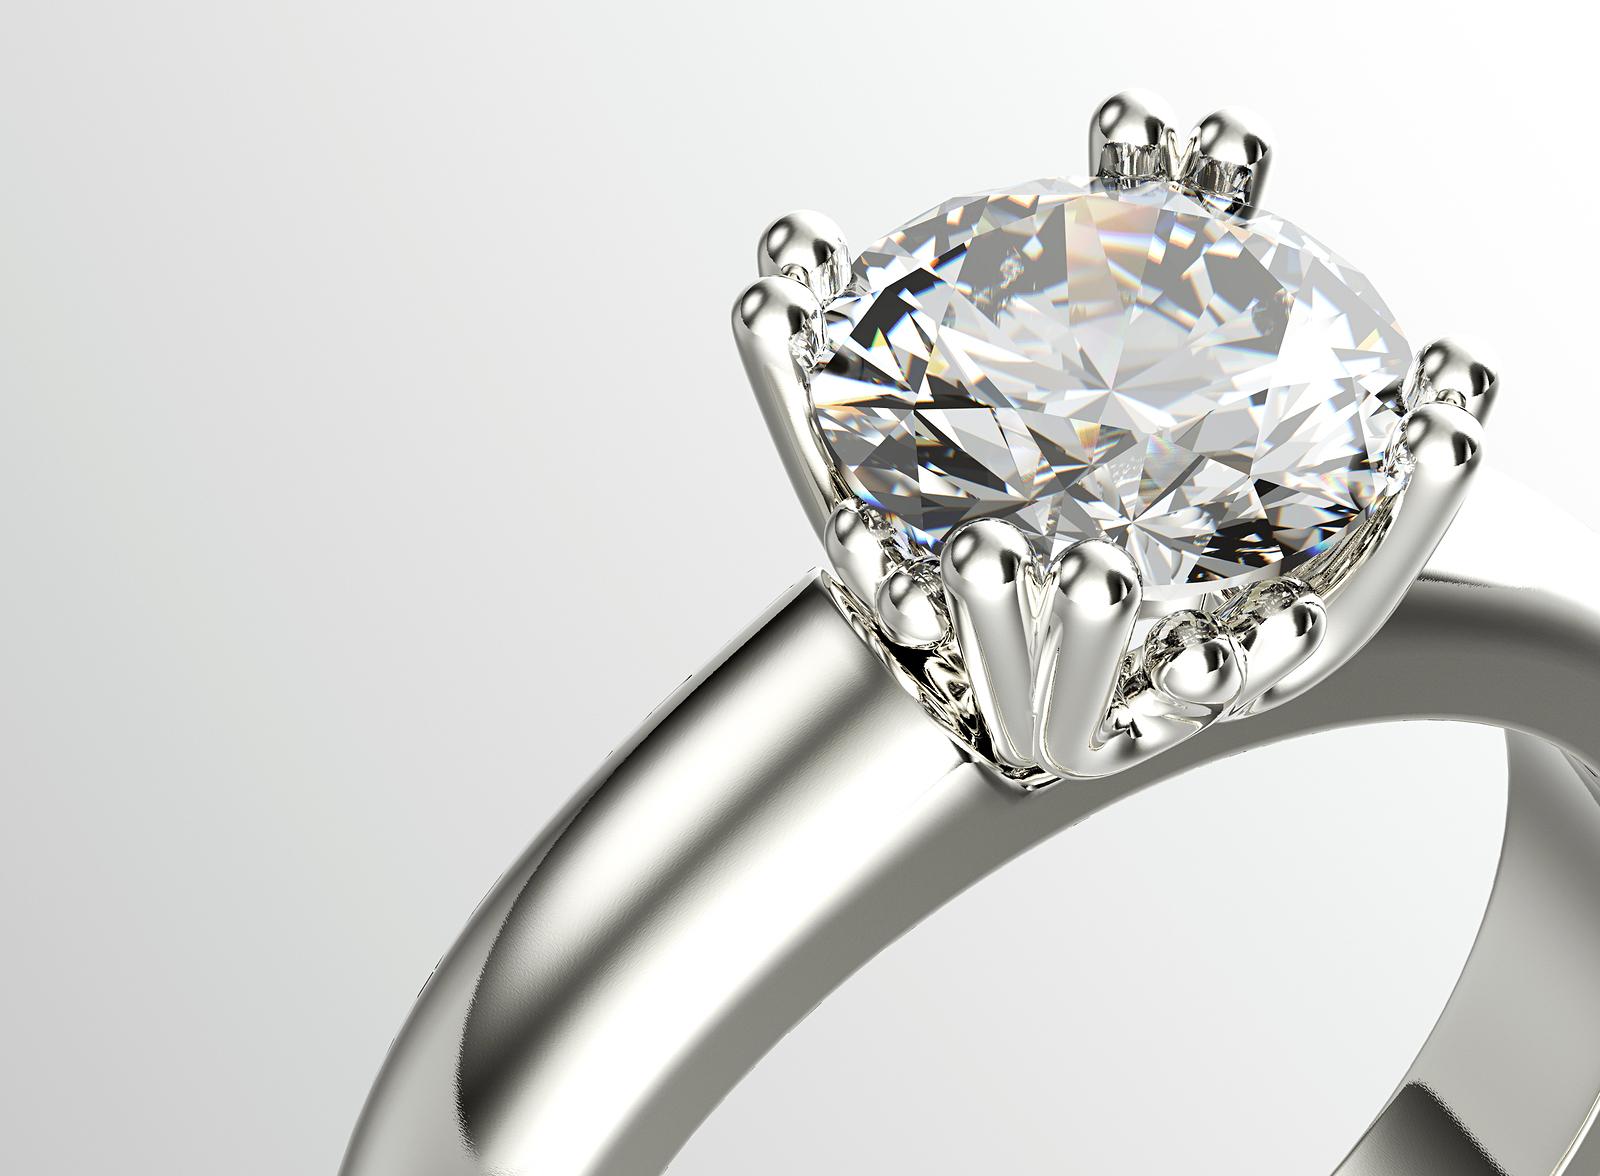 bigstock-Golden-Ring-with-Diamond-Jewe-82870277.jpg